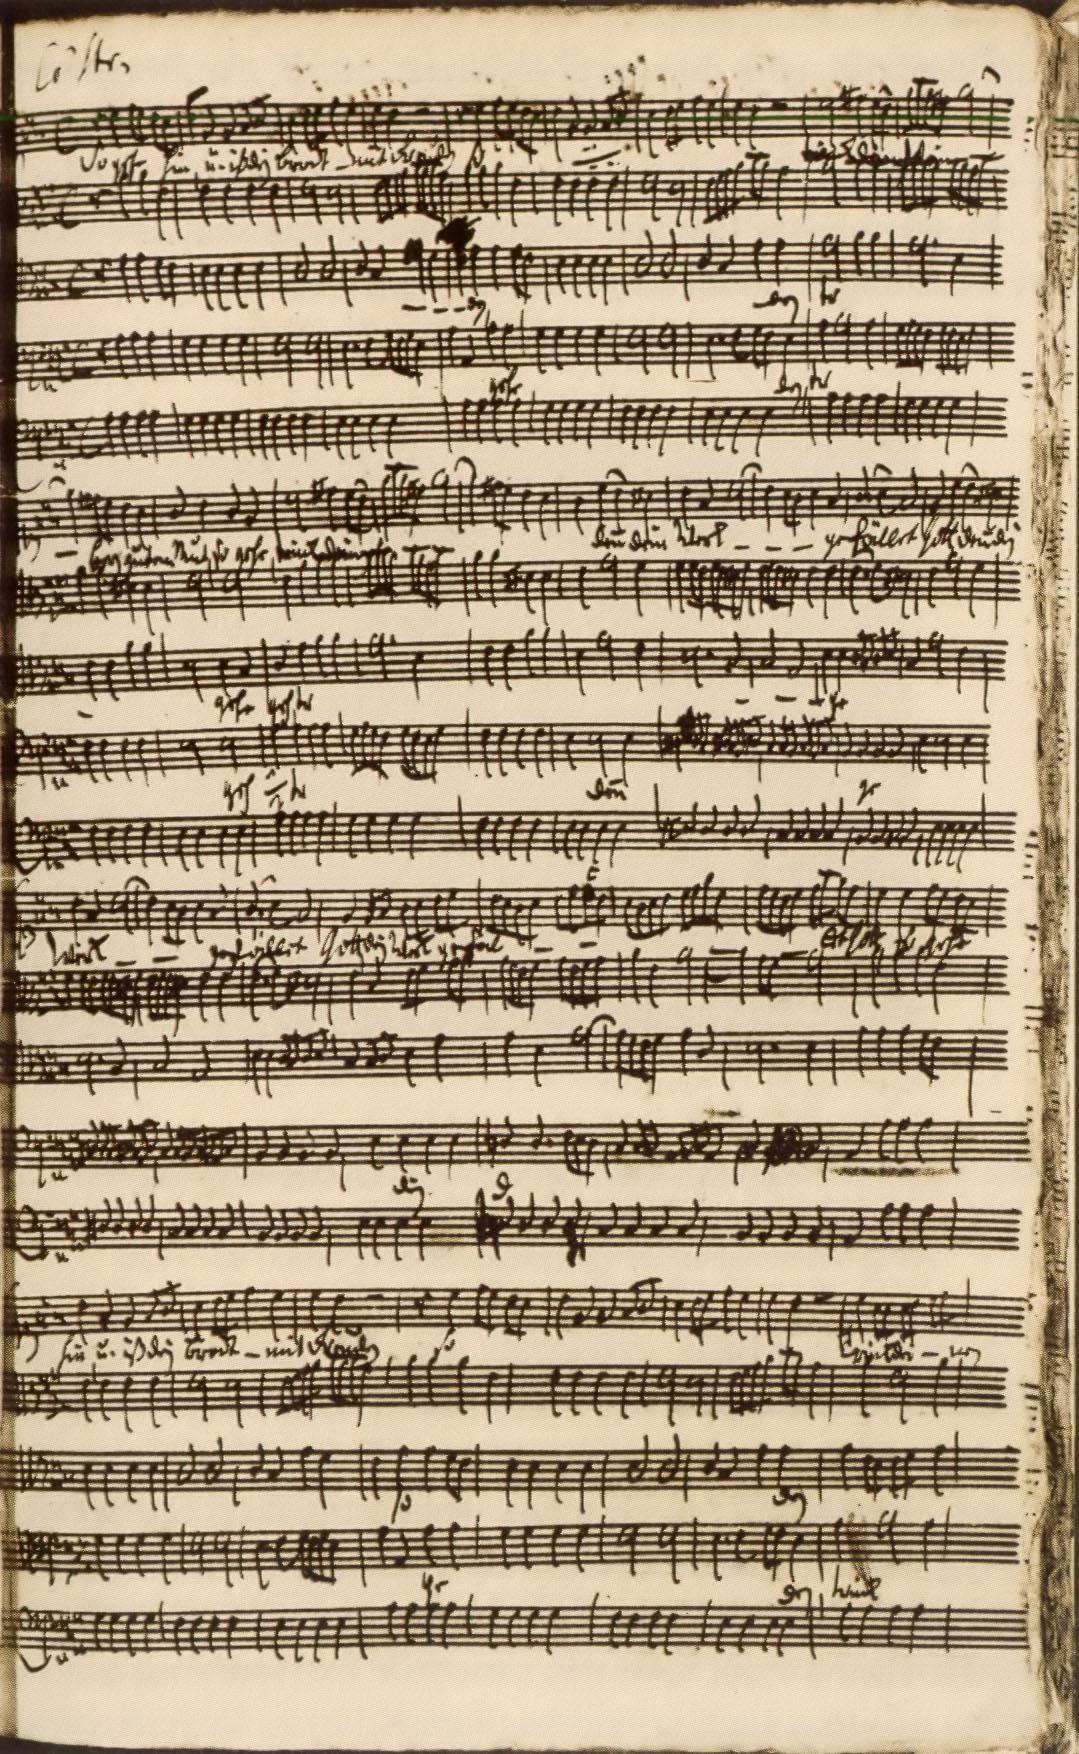 Página manuscrita do oratório ''Kapitänsmusik'' (1730), com o trecho ''So gehe hin und iß dein Brot mit Freuden''.